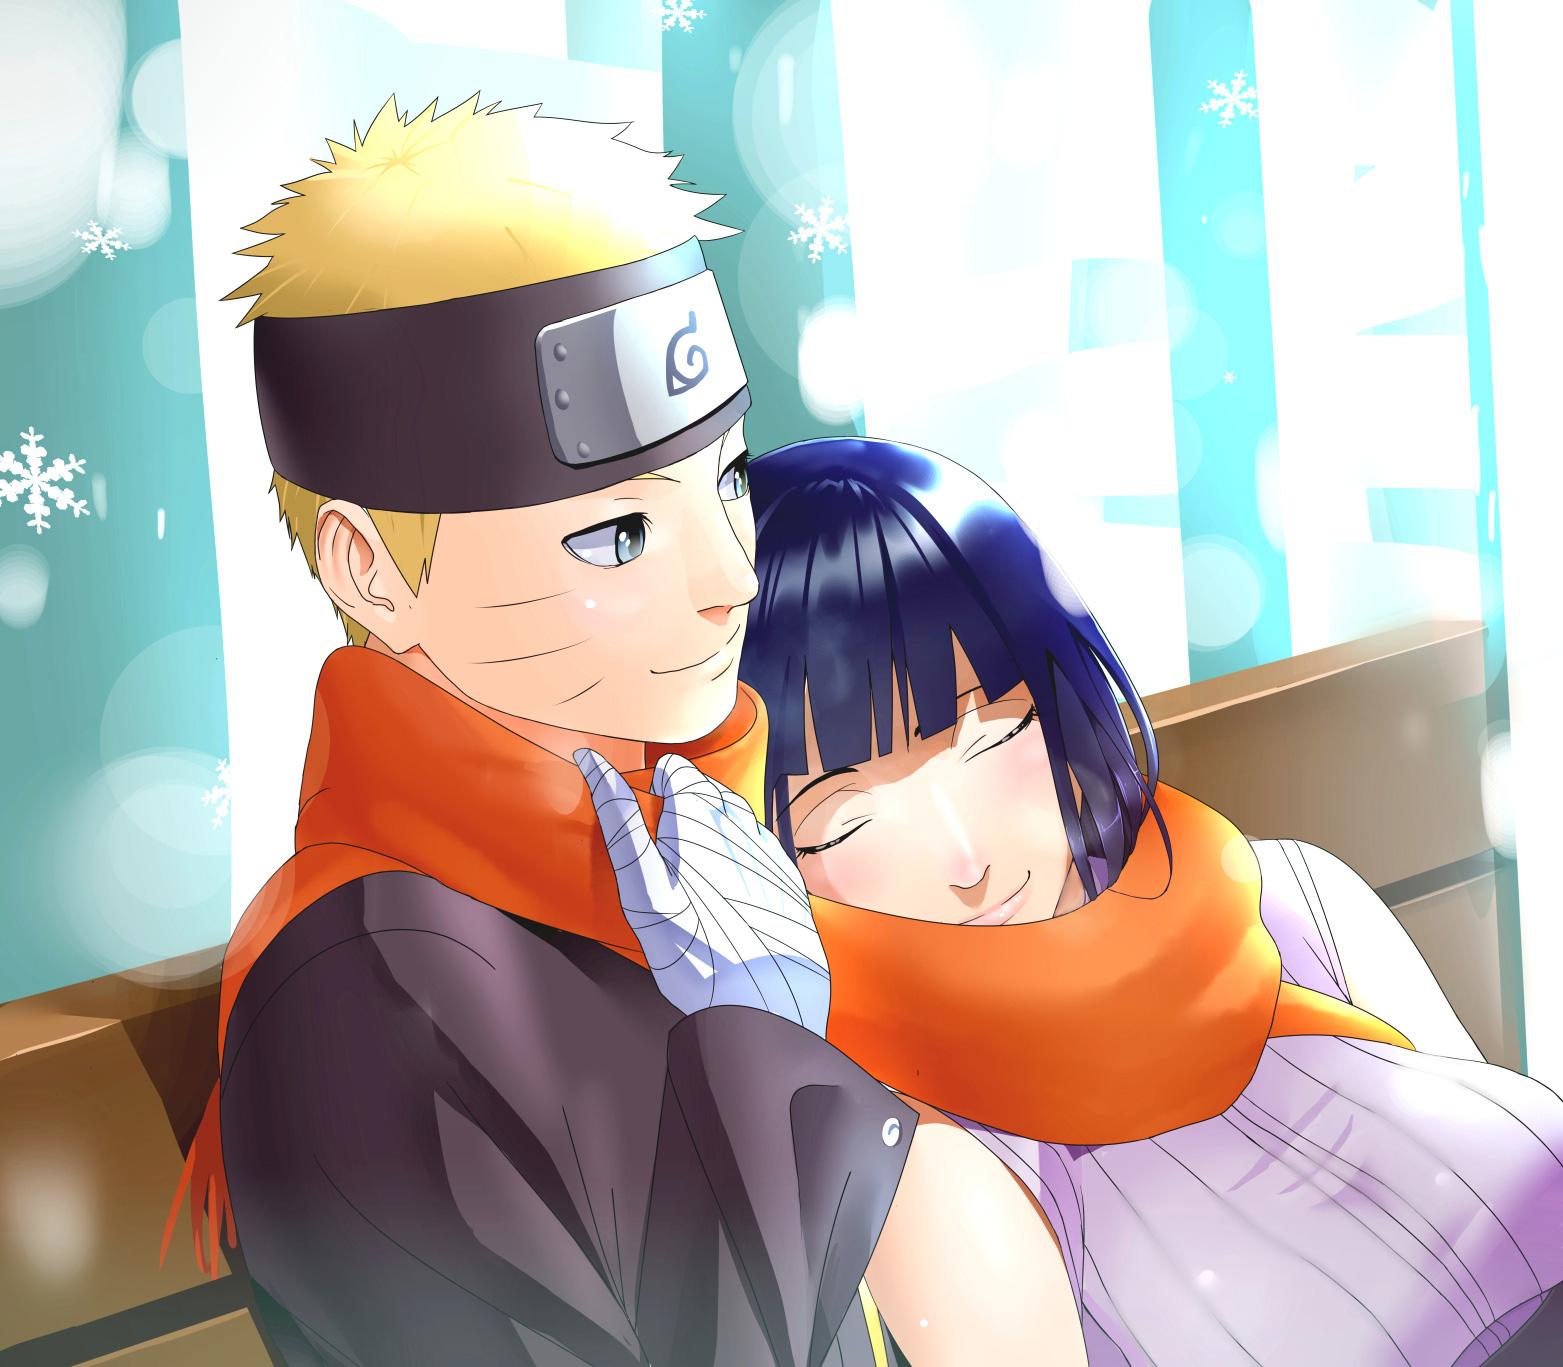 Top-Ten-Pixiv-Artworks-of-the-Week-#2-Naruto-Edition_Haruhichan.com_#9_-さらば青春_黒雷